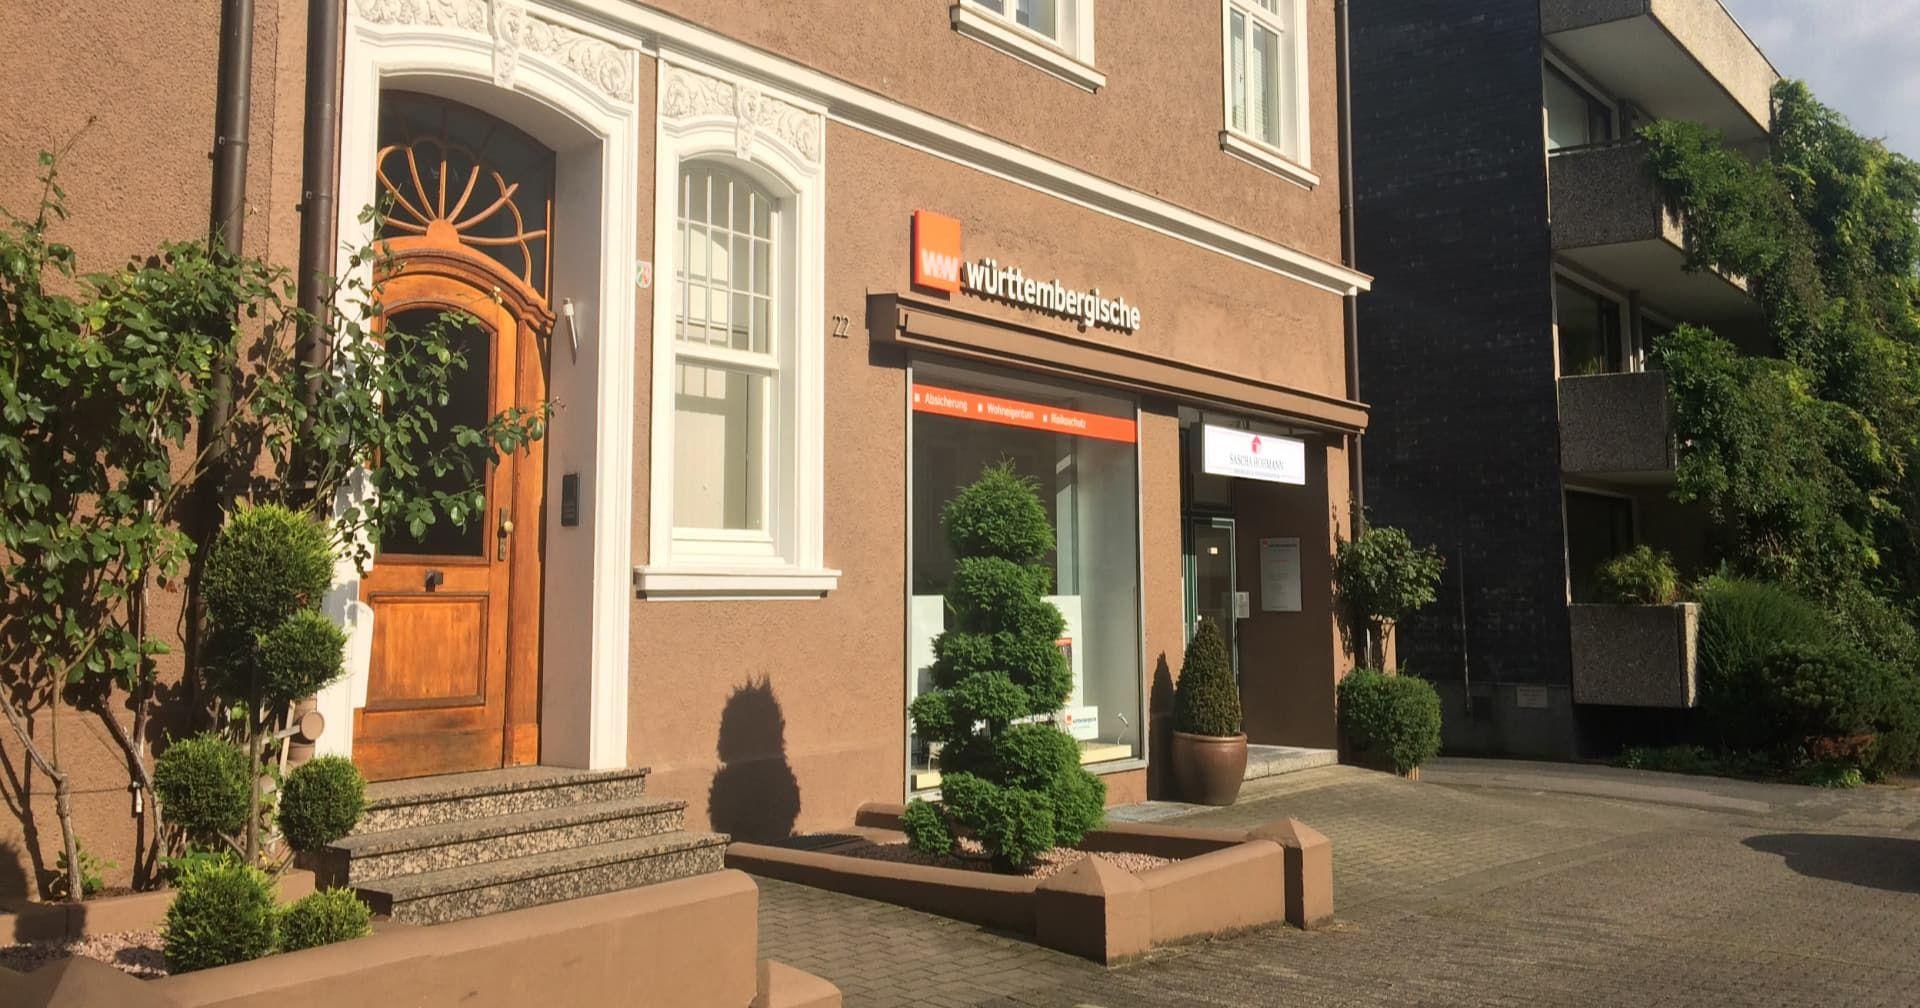 Immobilien verkaufen in Wuppertal